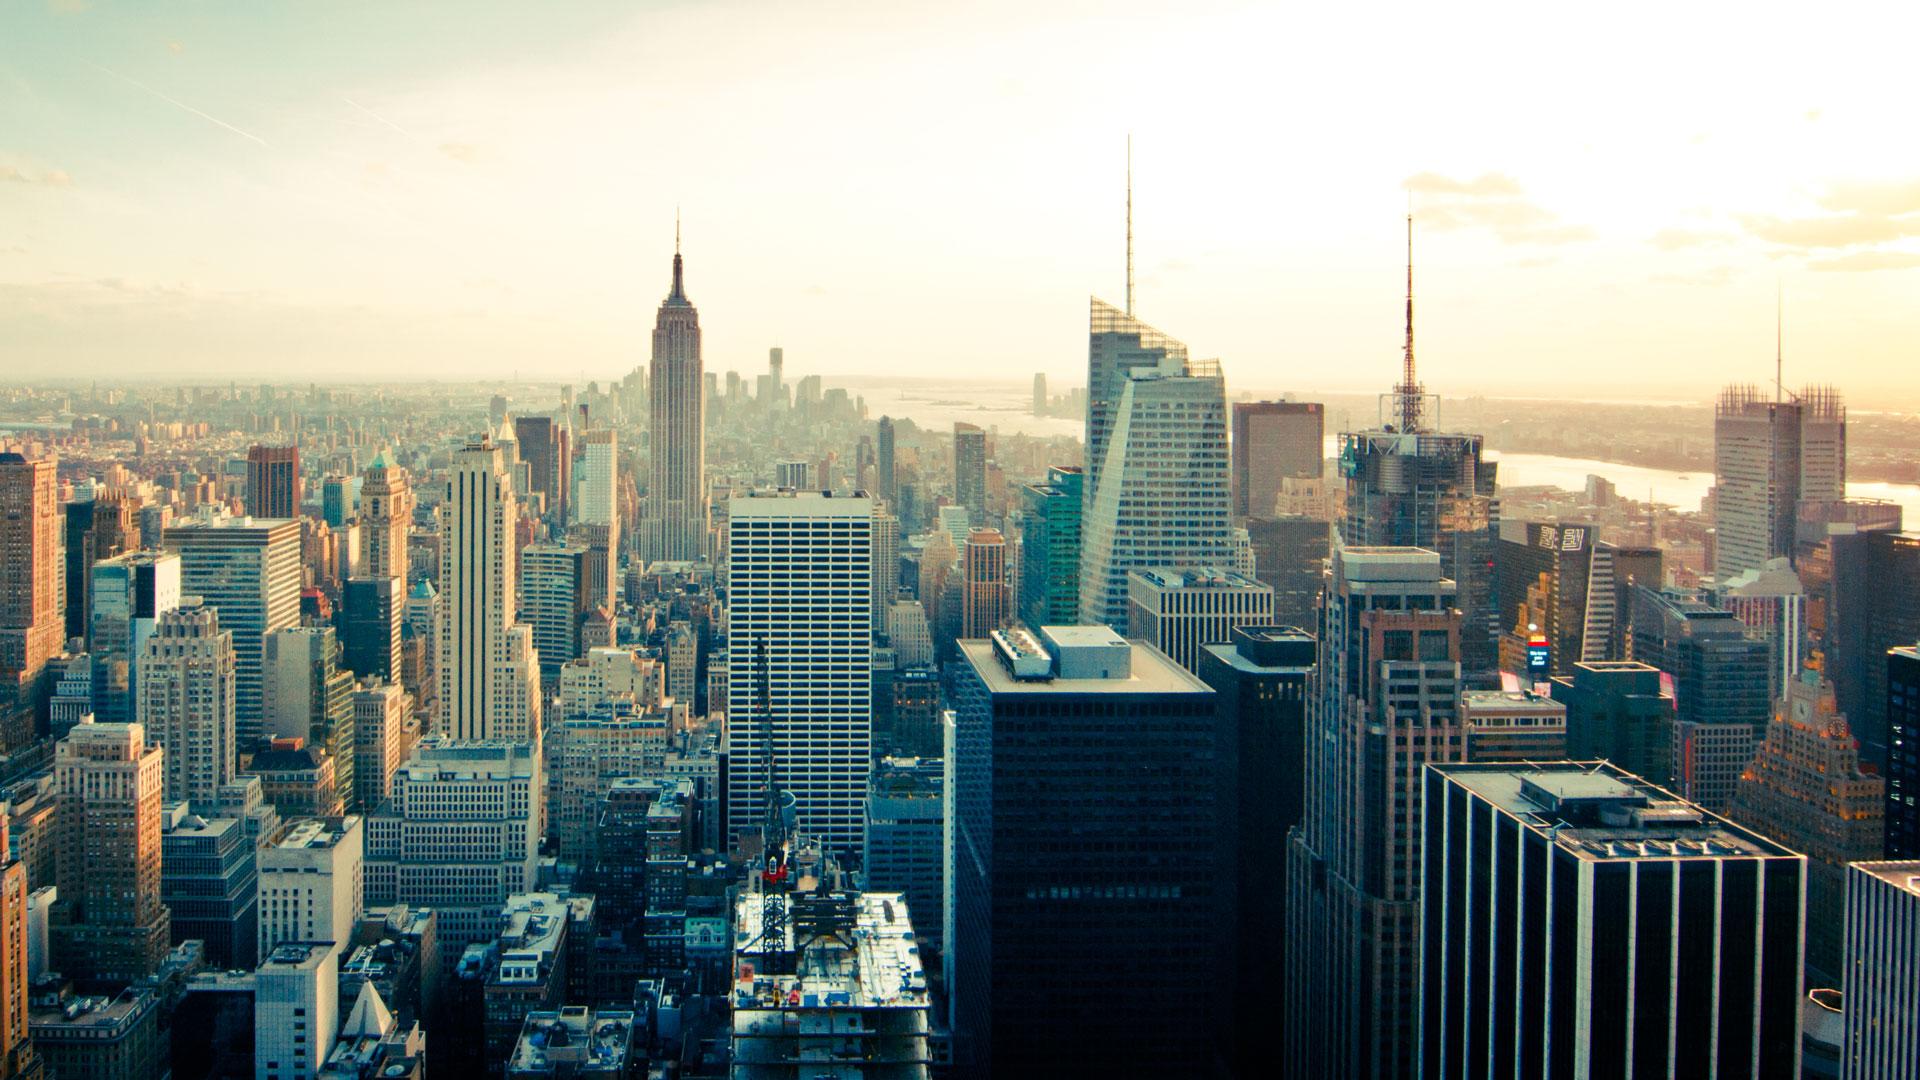 Skyline in Daylight